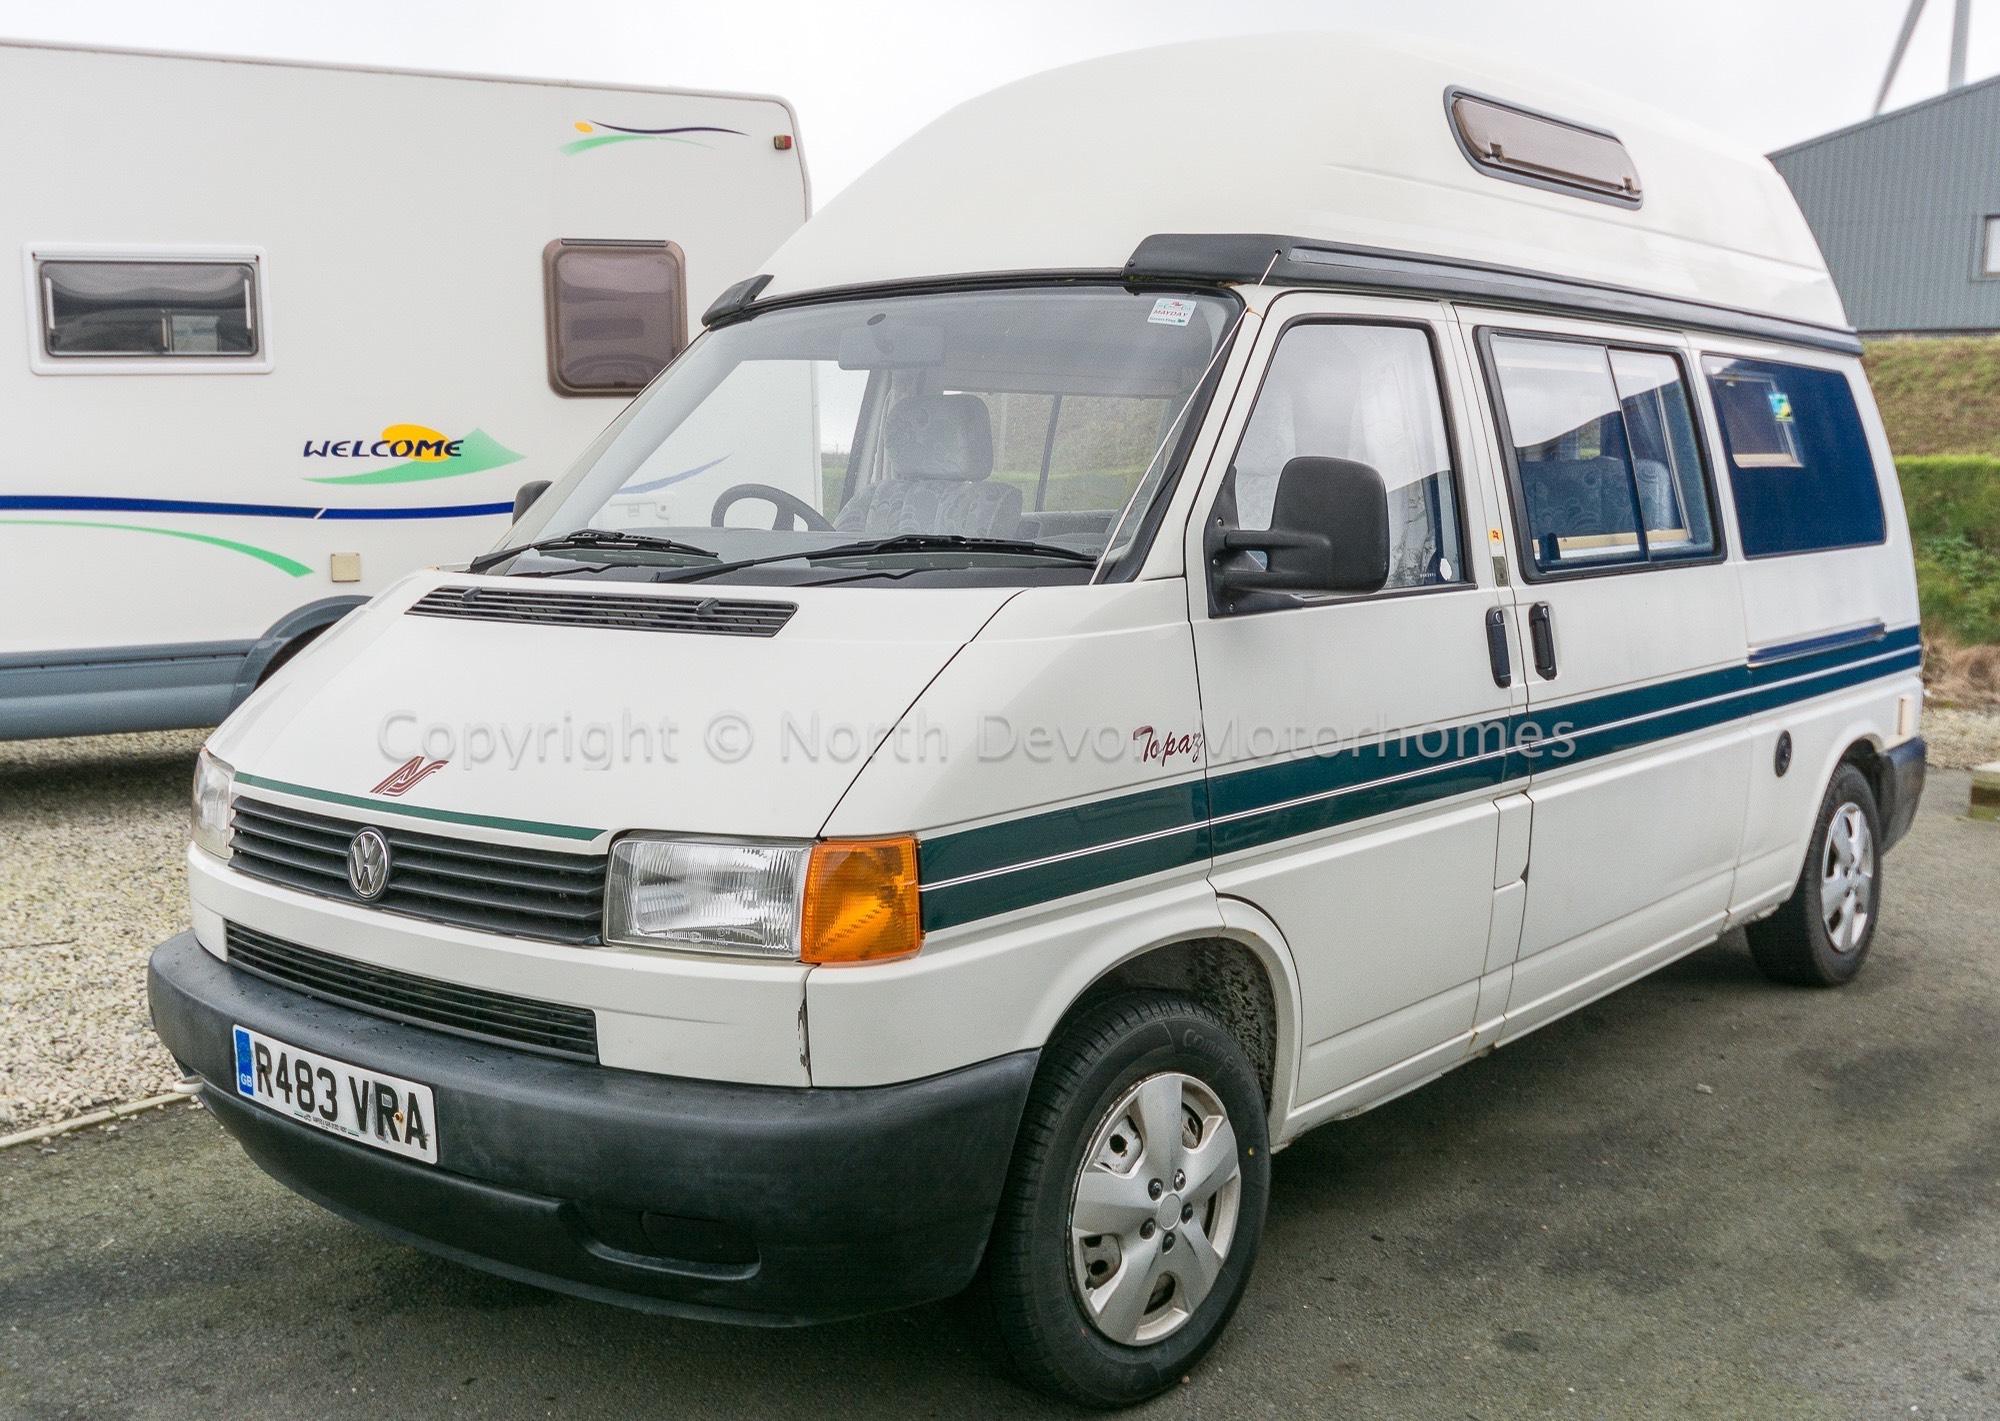 Sold Autosleeper Topaz Vw T4 Auto Petrol 1997 End